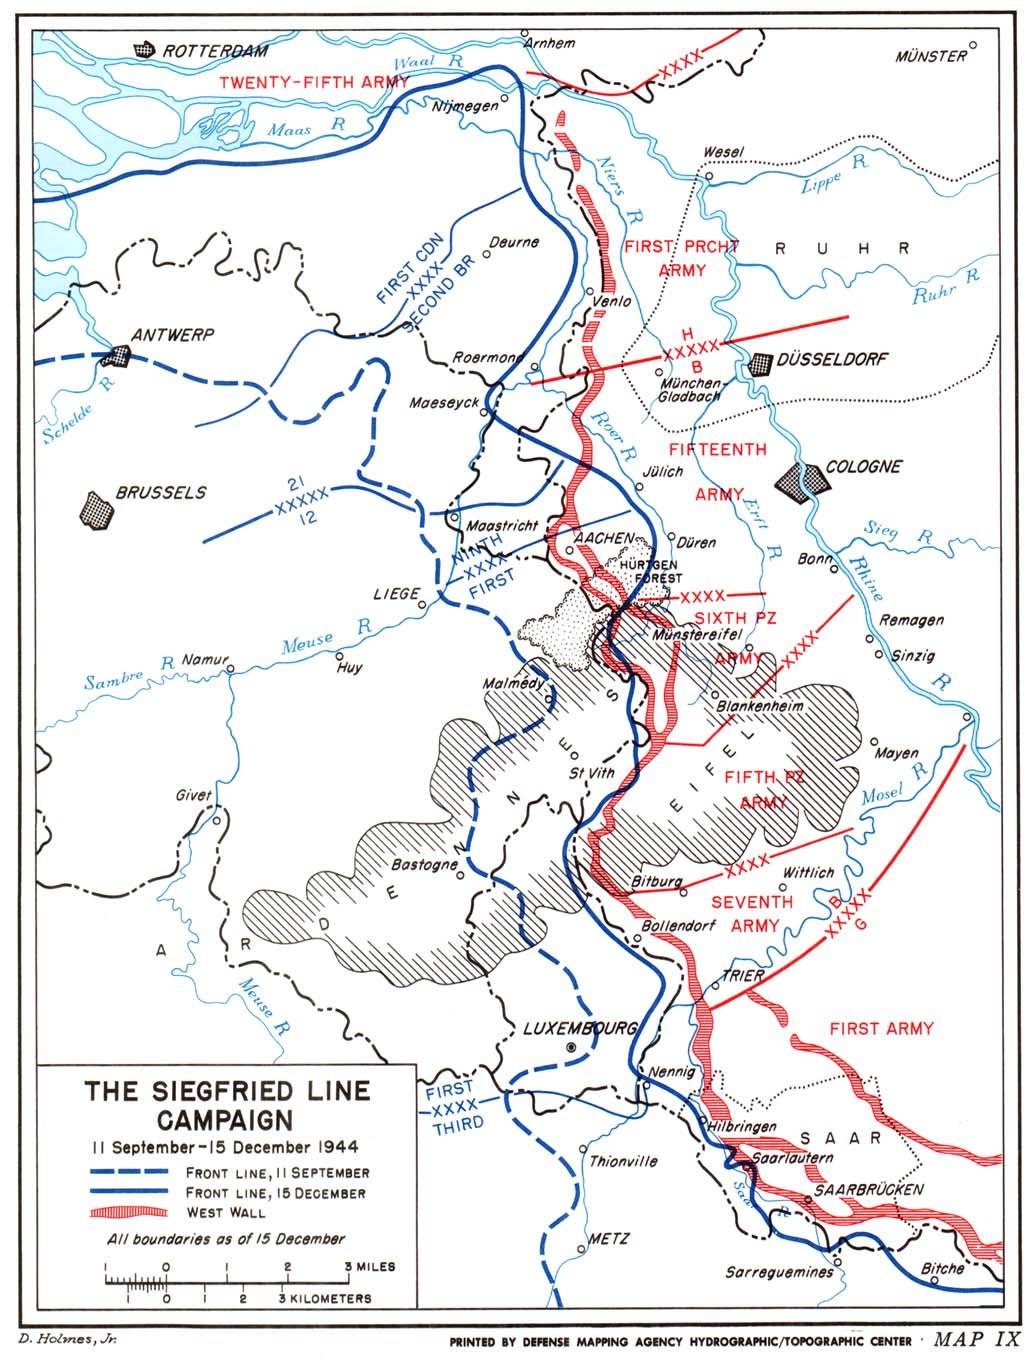 The Siegfried Line Campaign Maps